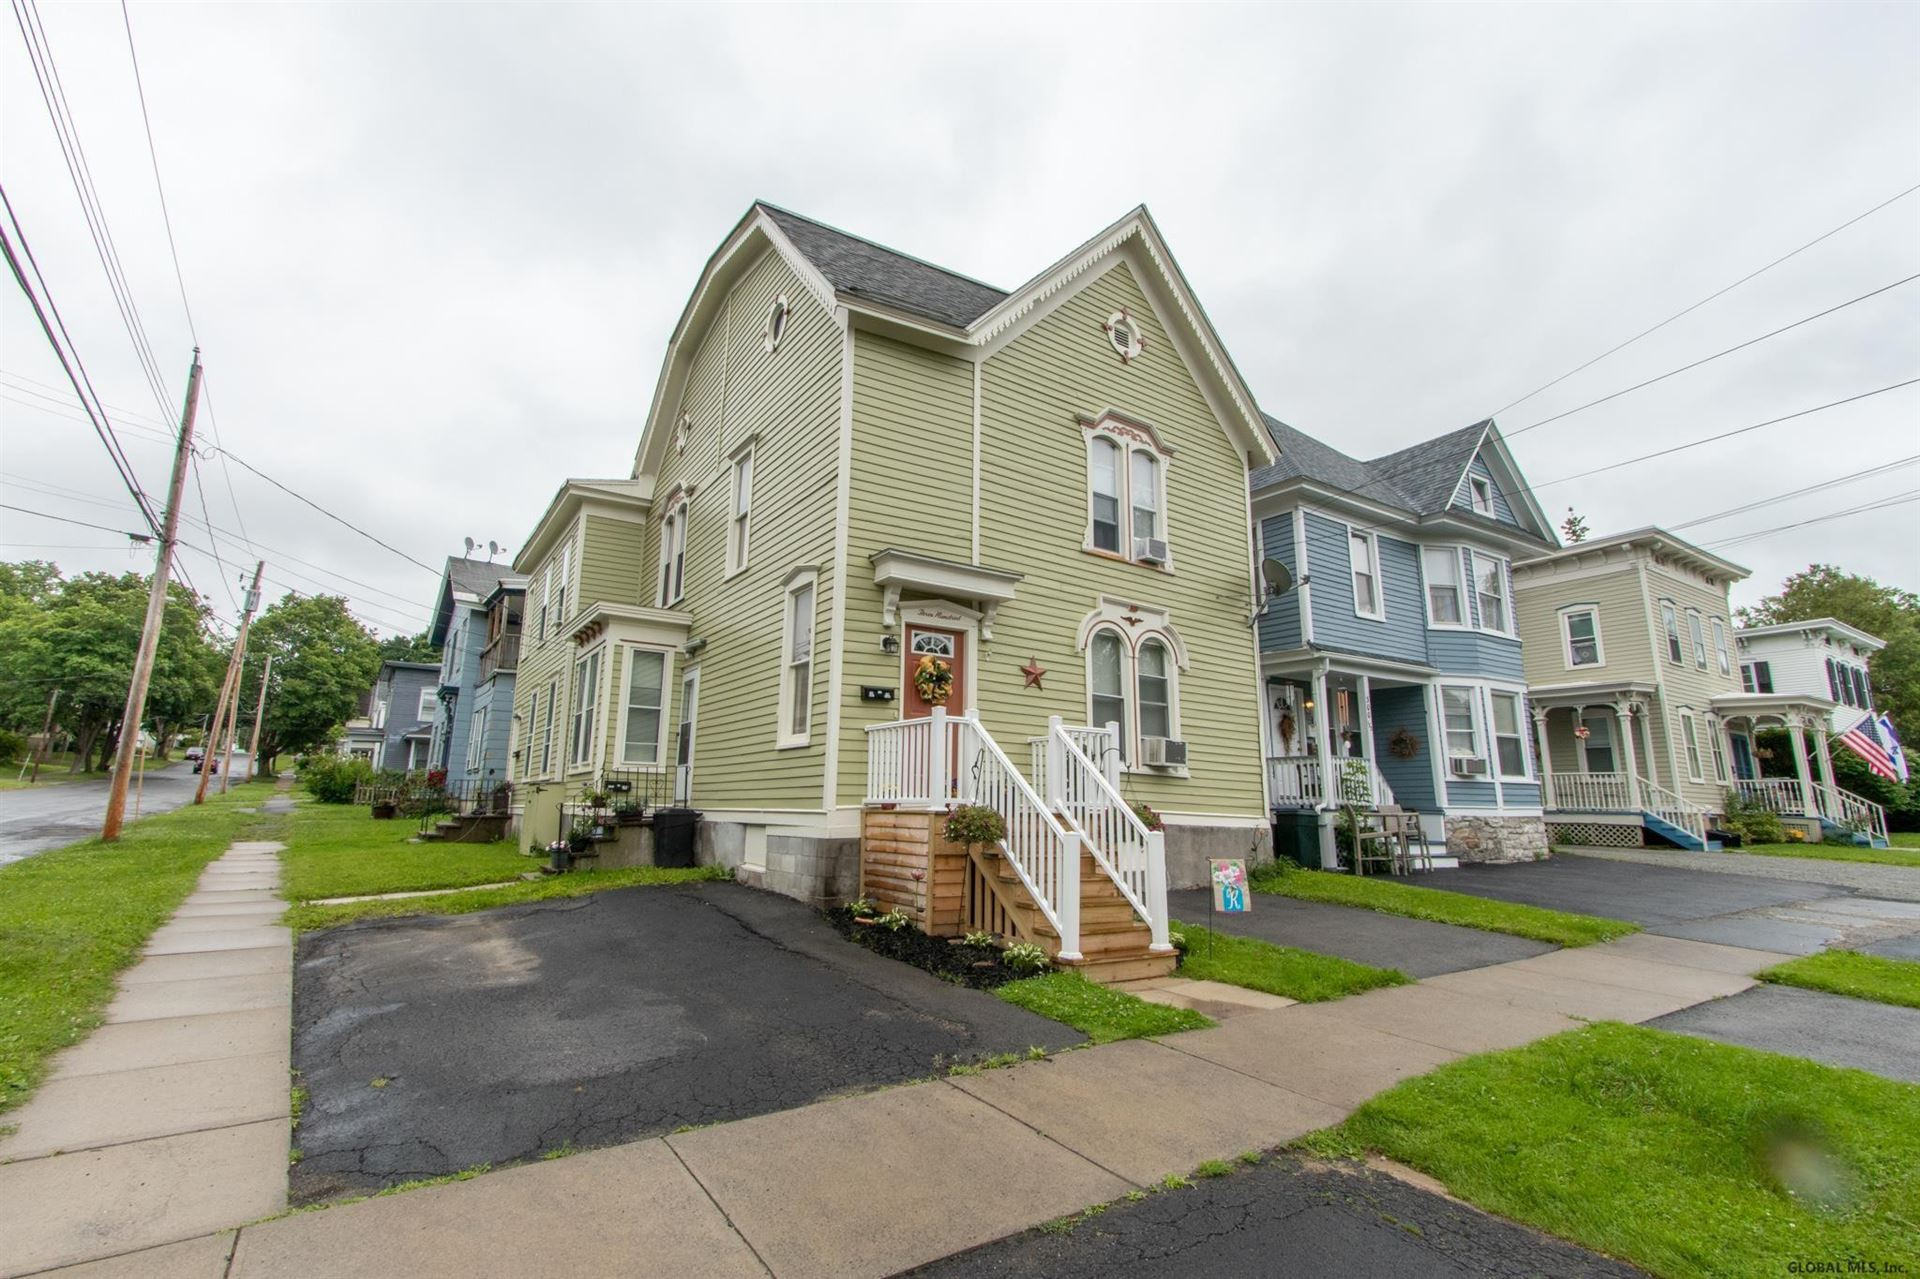 300 S WILLIAM ST, Johnstown, NY 12095 - MLS#: 202122825